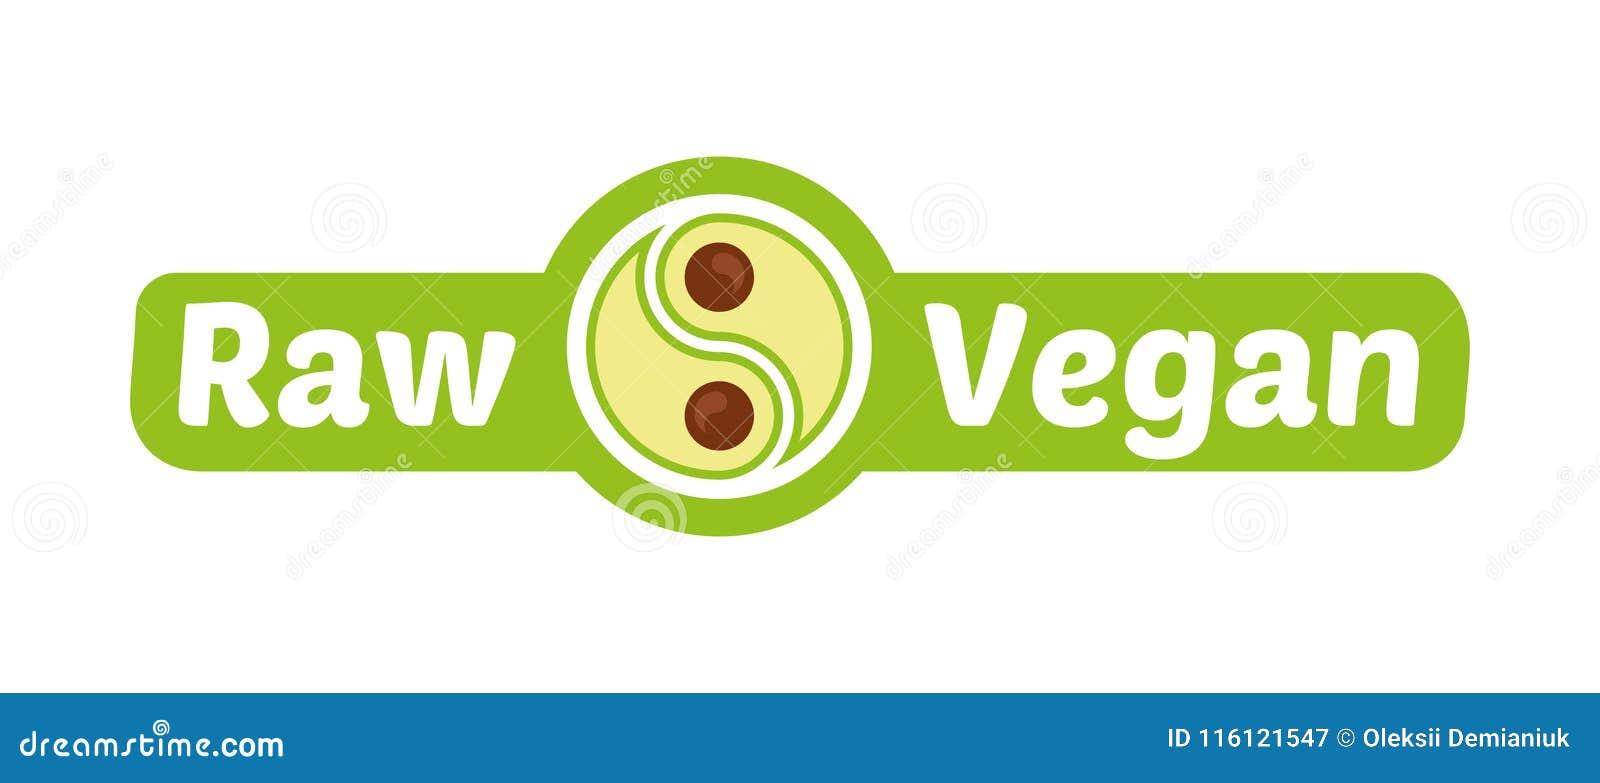 Raw vegan logo stock vector. Illustration of restaurant ...